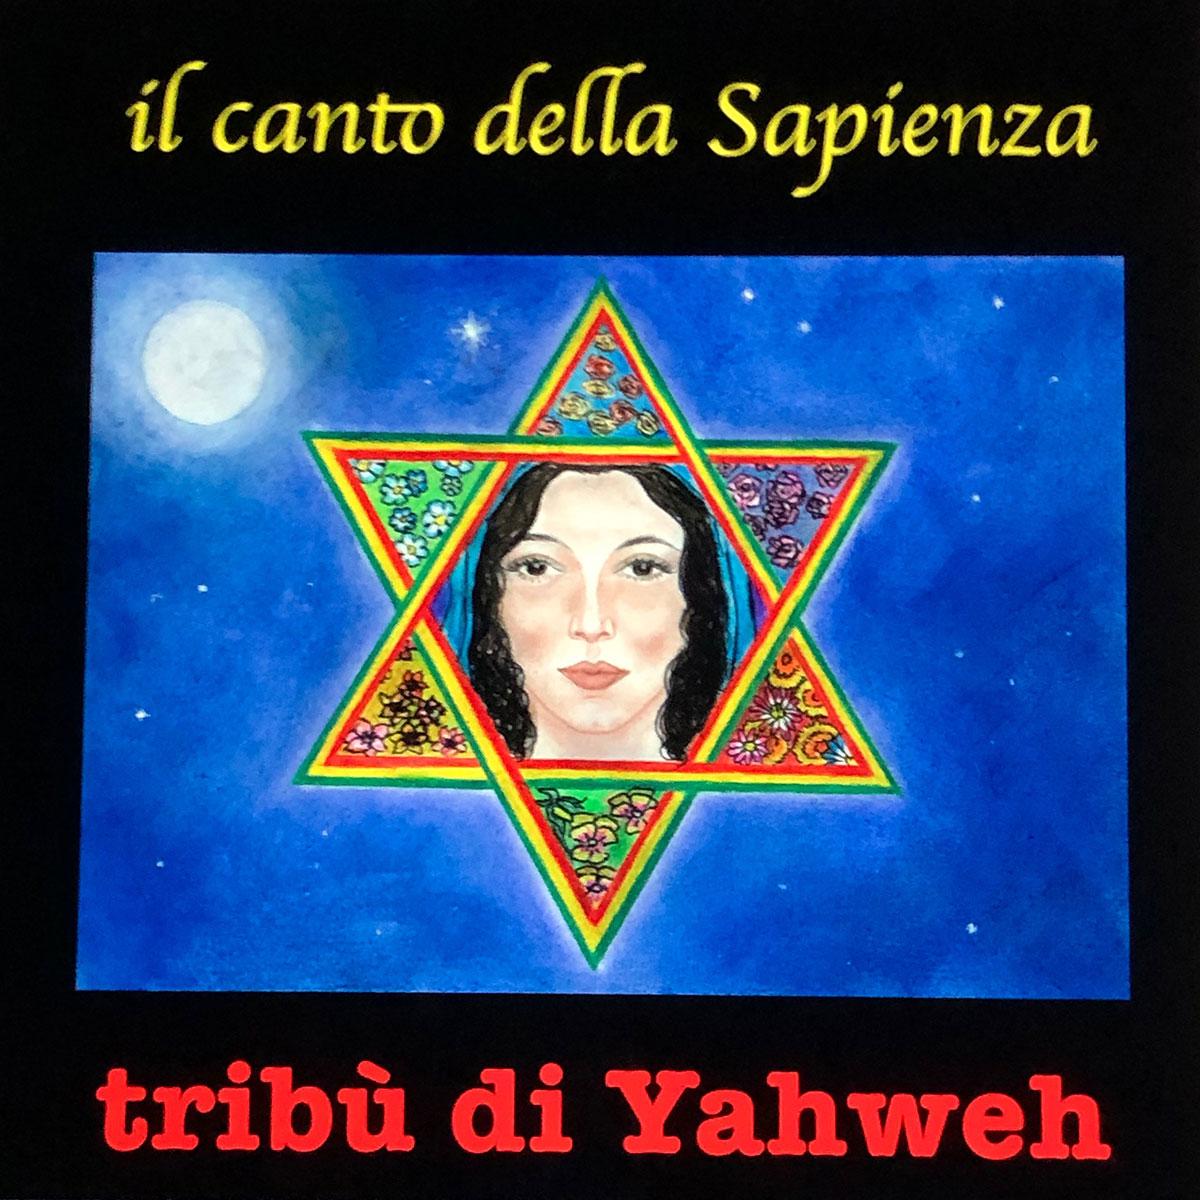 http://www.tribudiyahweh.com/wp/wp-content/uploads/2019/02/il-canto-della-sapienza.jpg